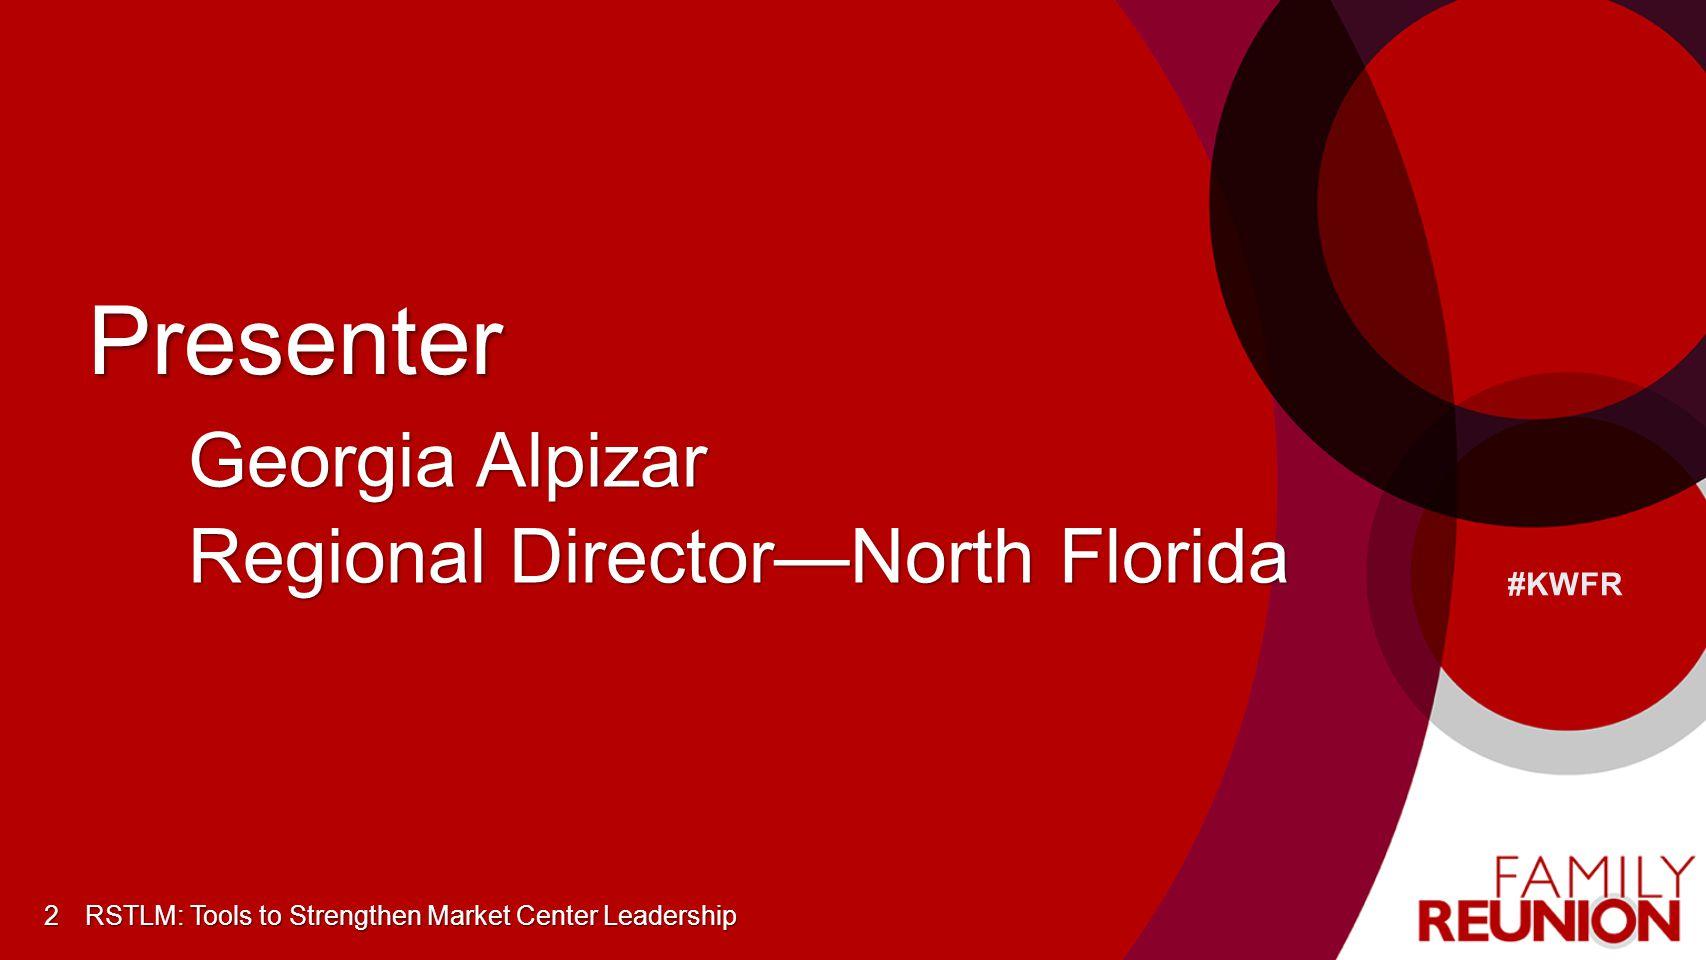 Presenter Georgia Alpizar Regional Director—North Florida